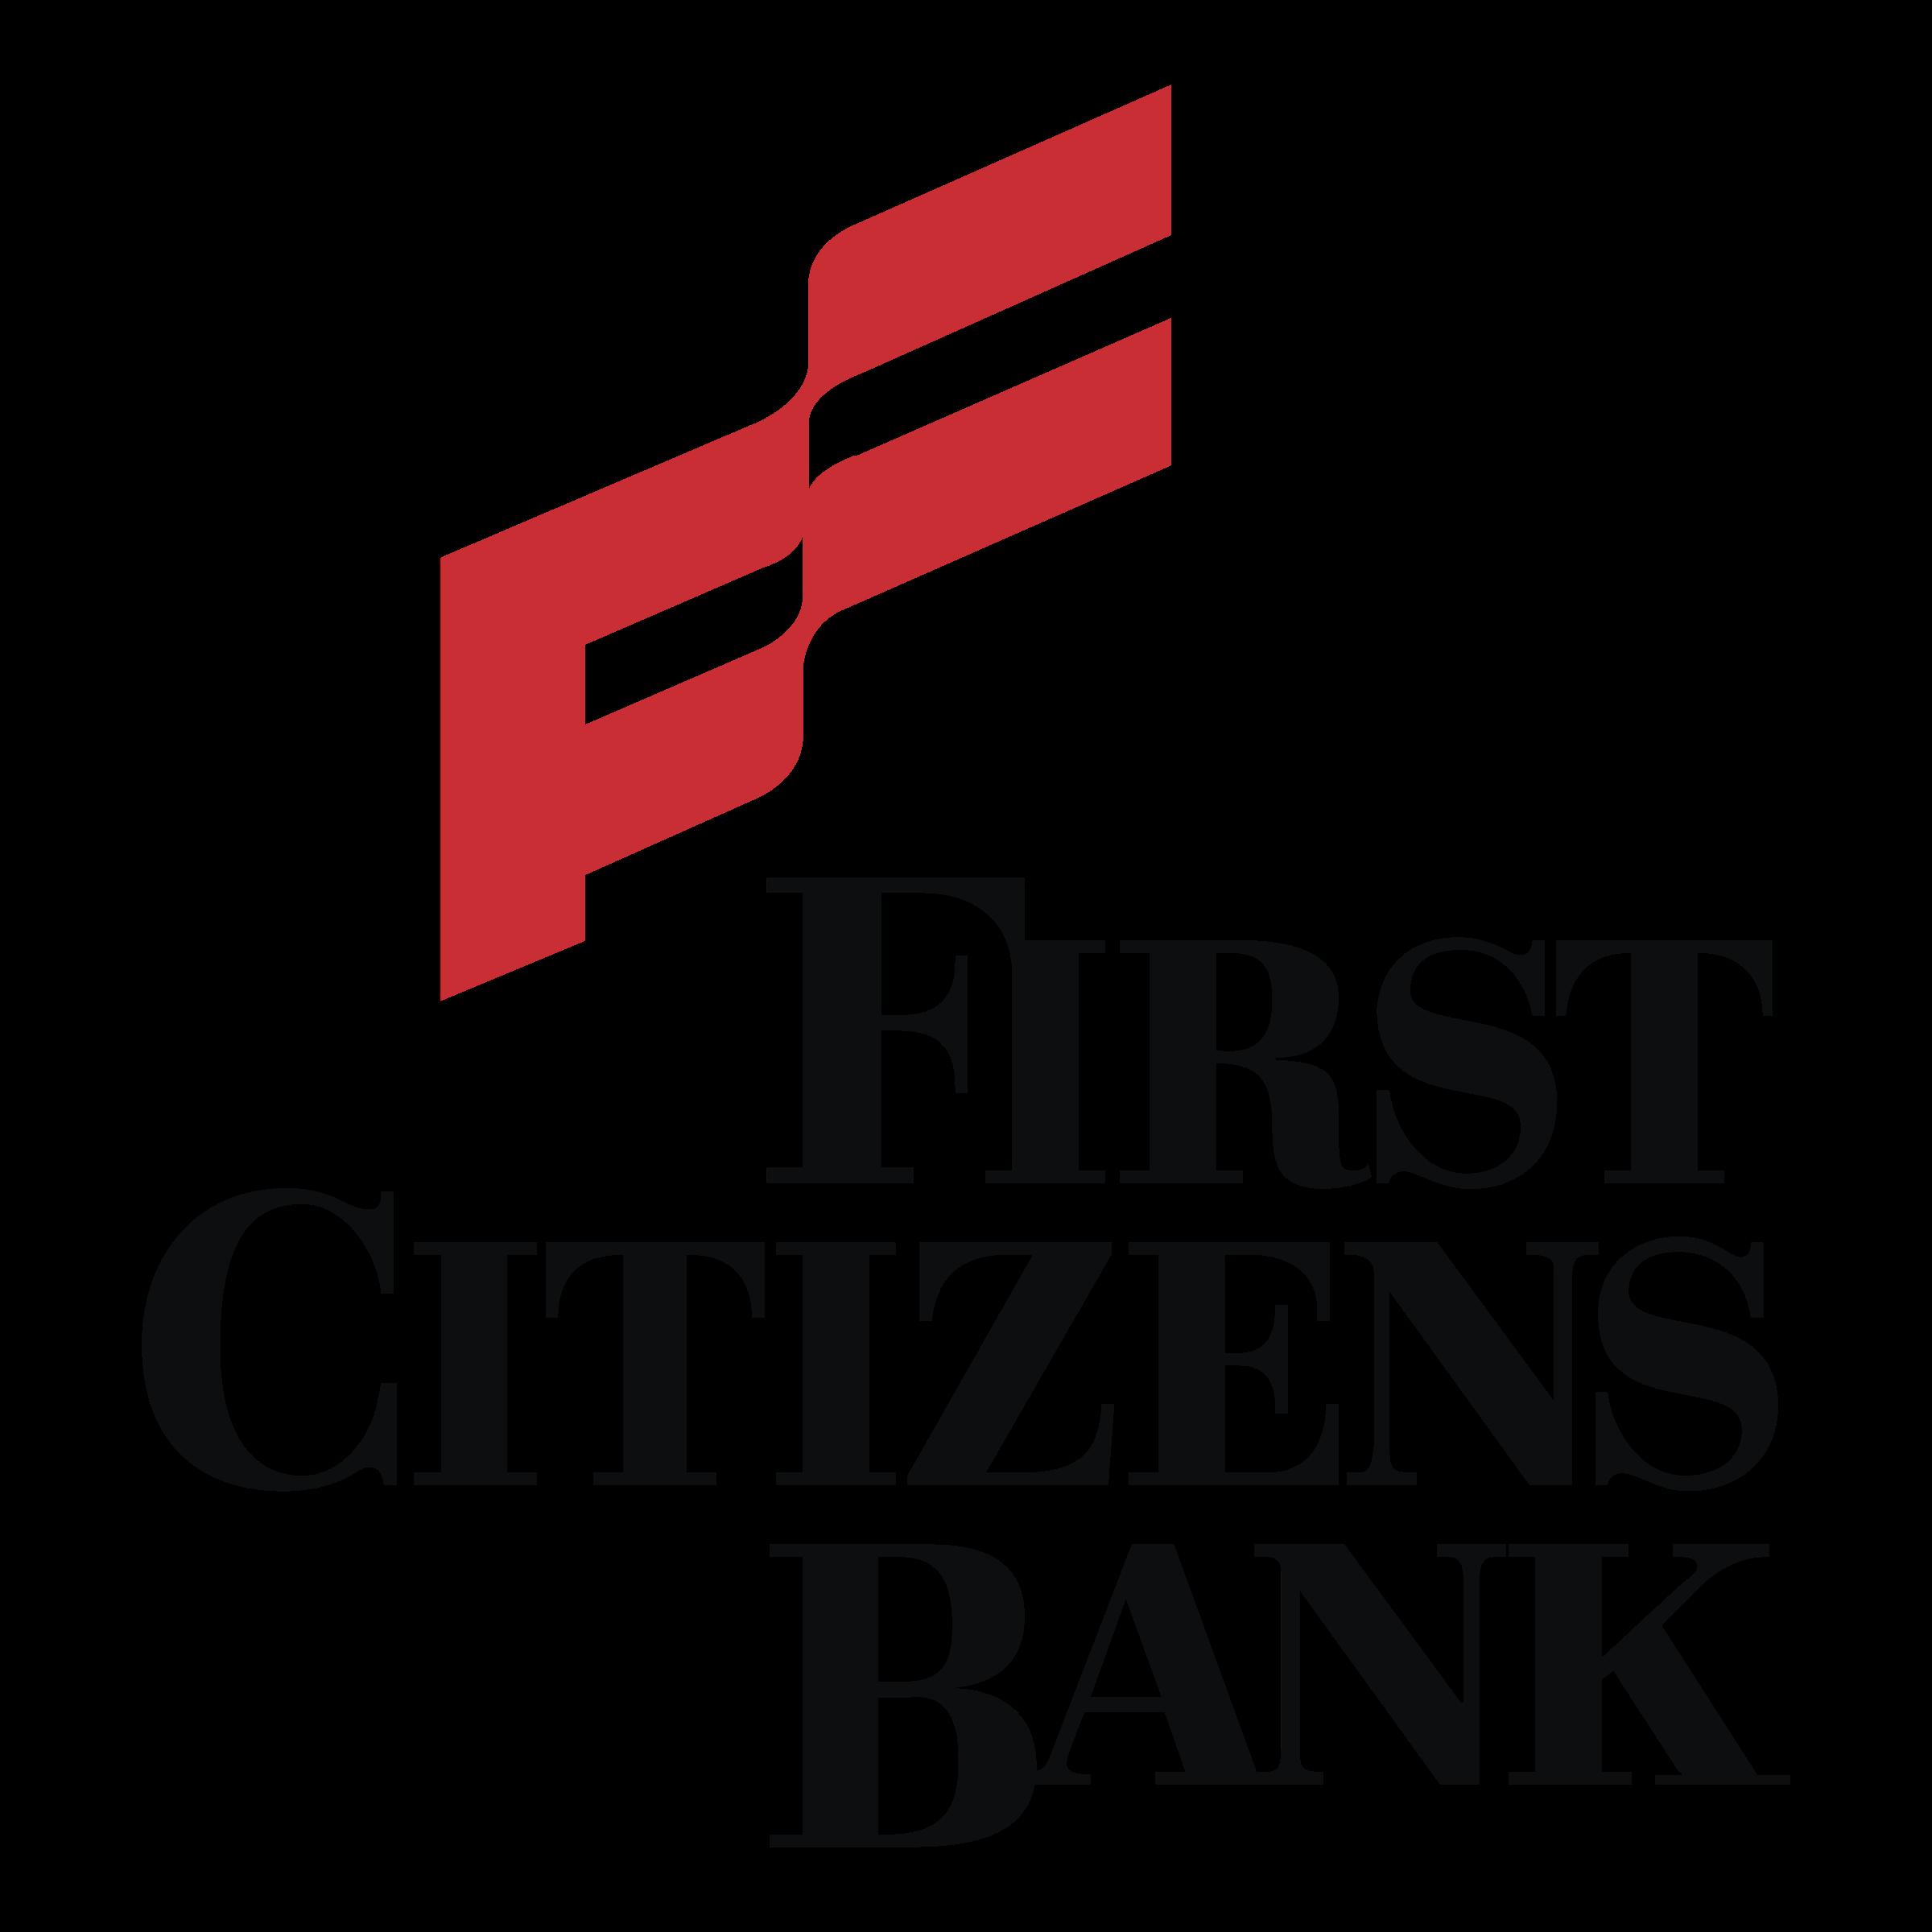 First Citizens Bank Logo Png